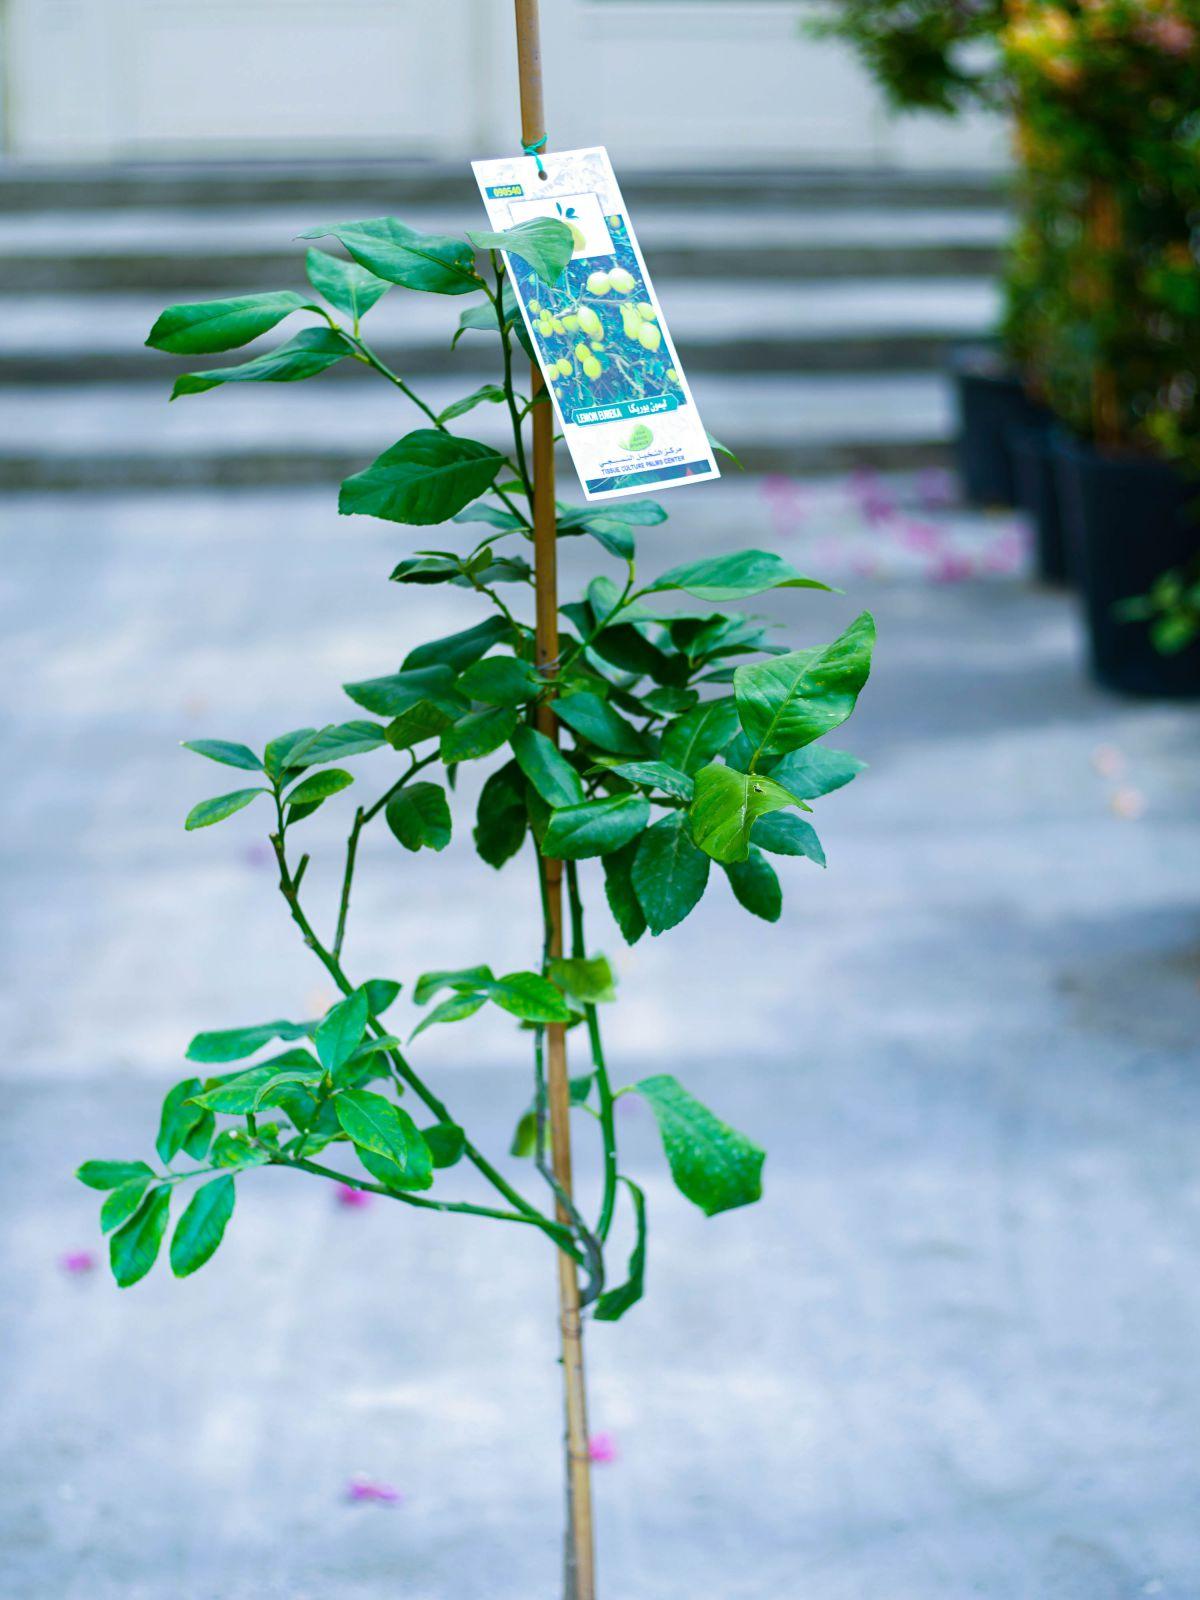 Eureka Lemon Outdoor Plants Fruit Plants